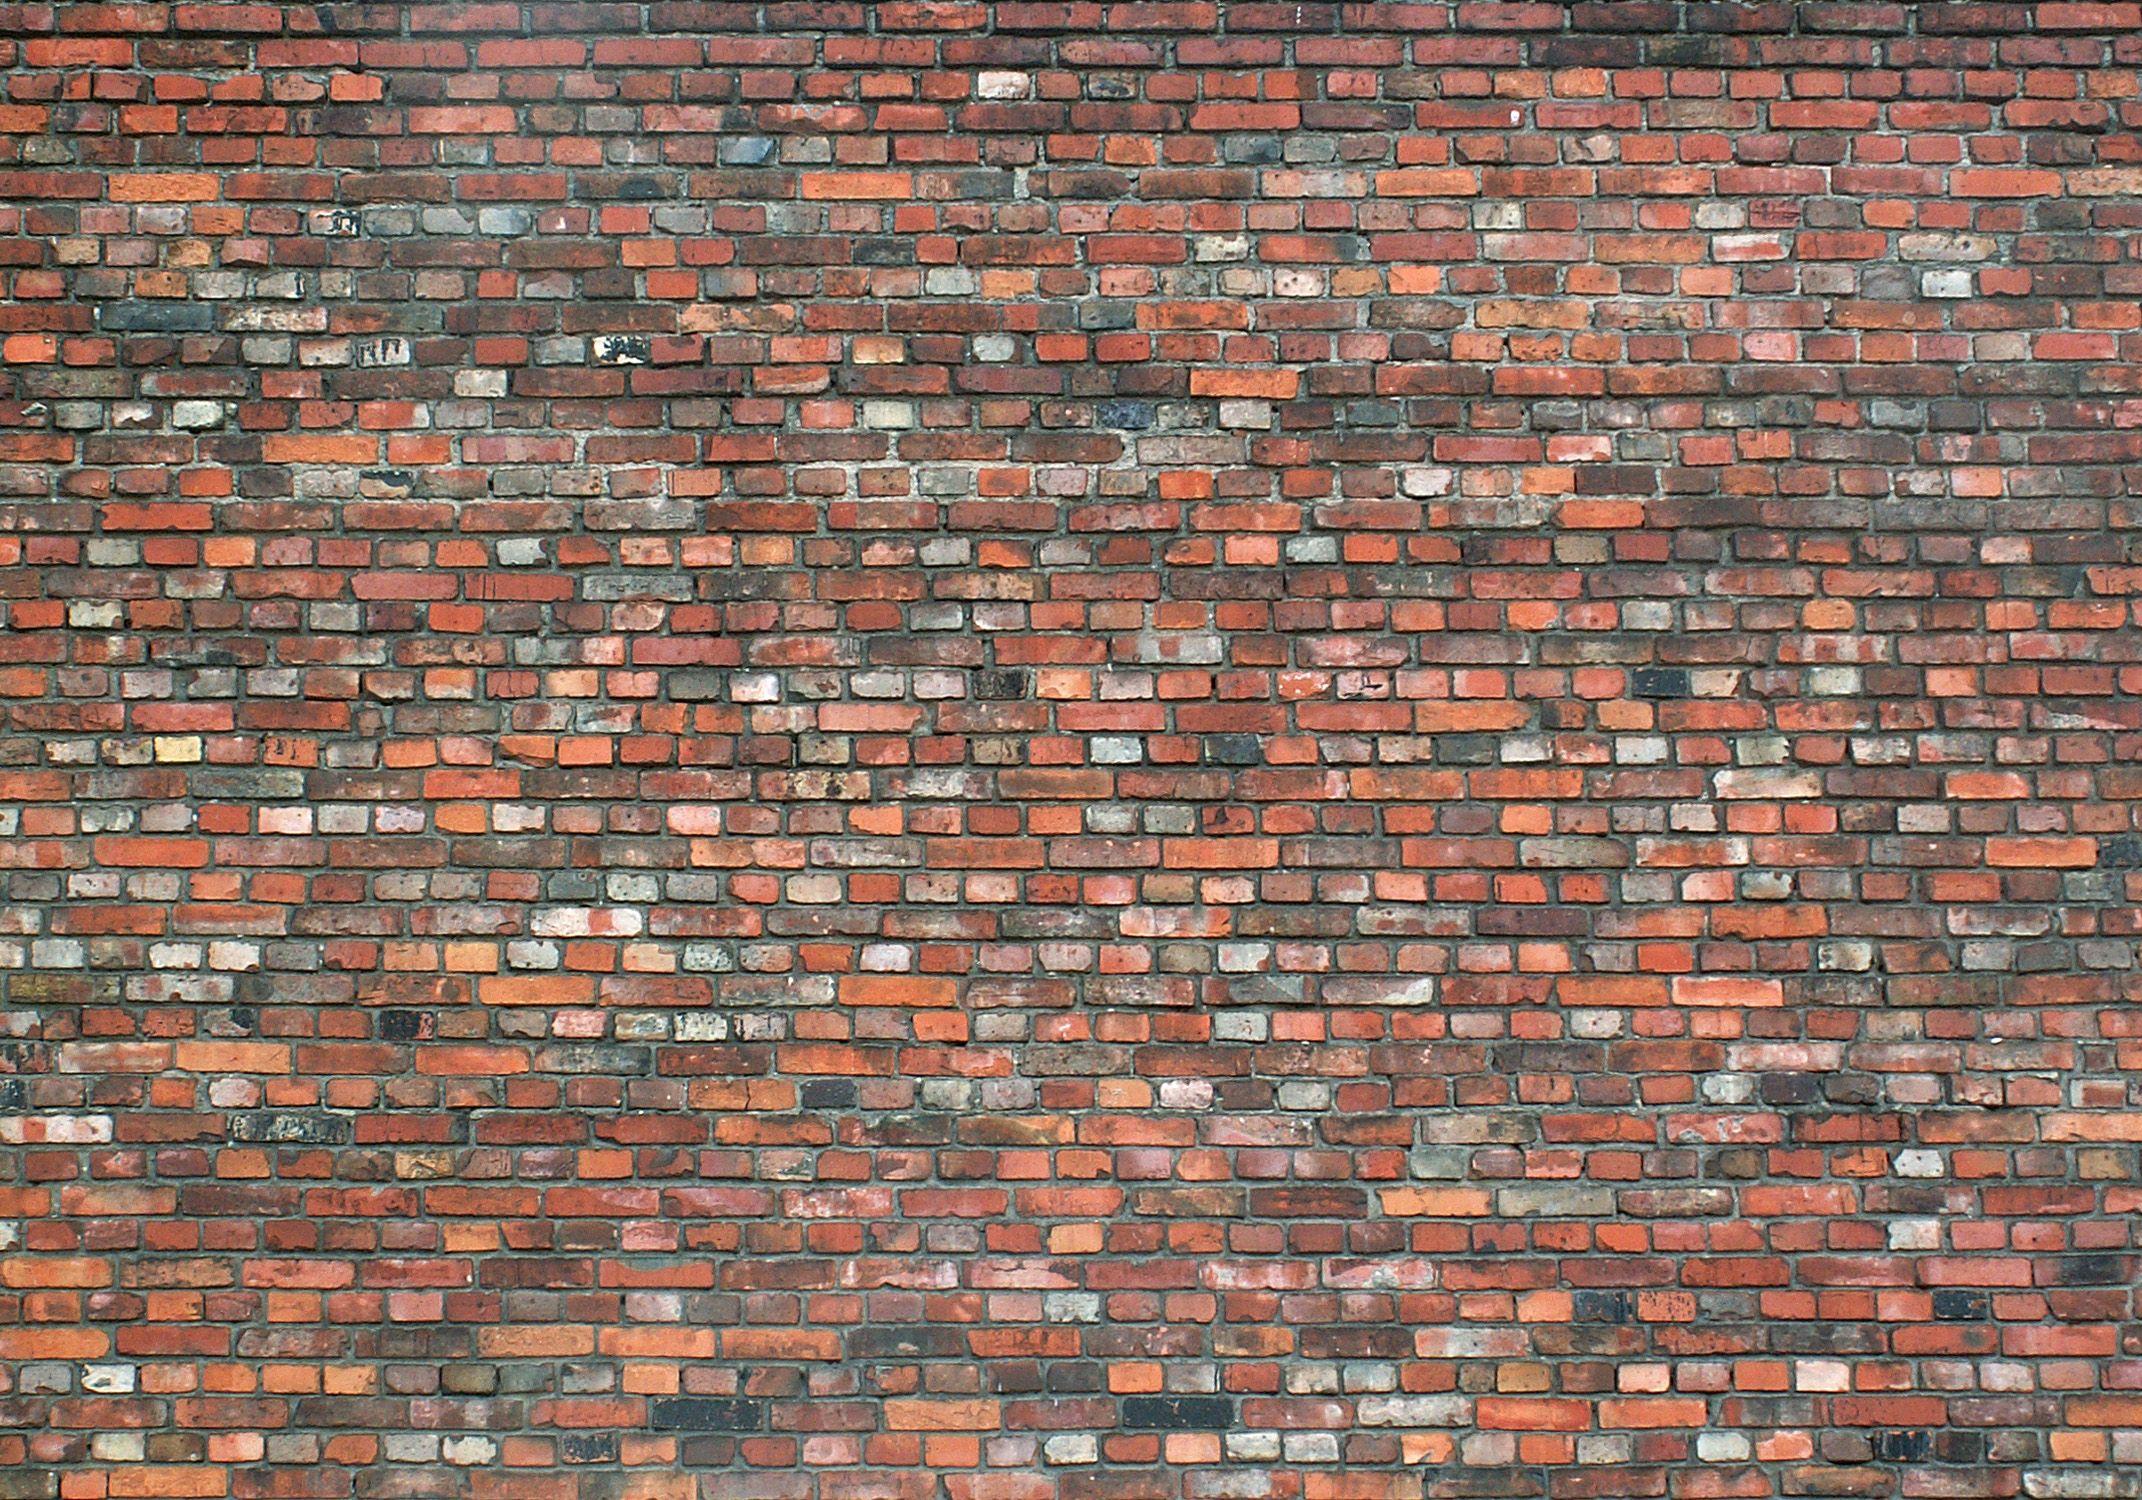 Brick Wall Texture, Photo, Image, Bricks, Brick Masonry, Bricks